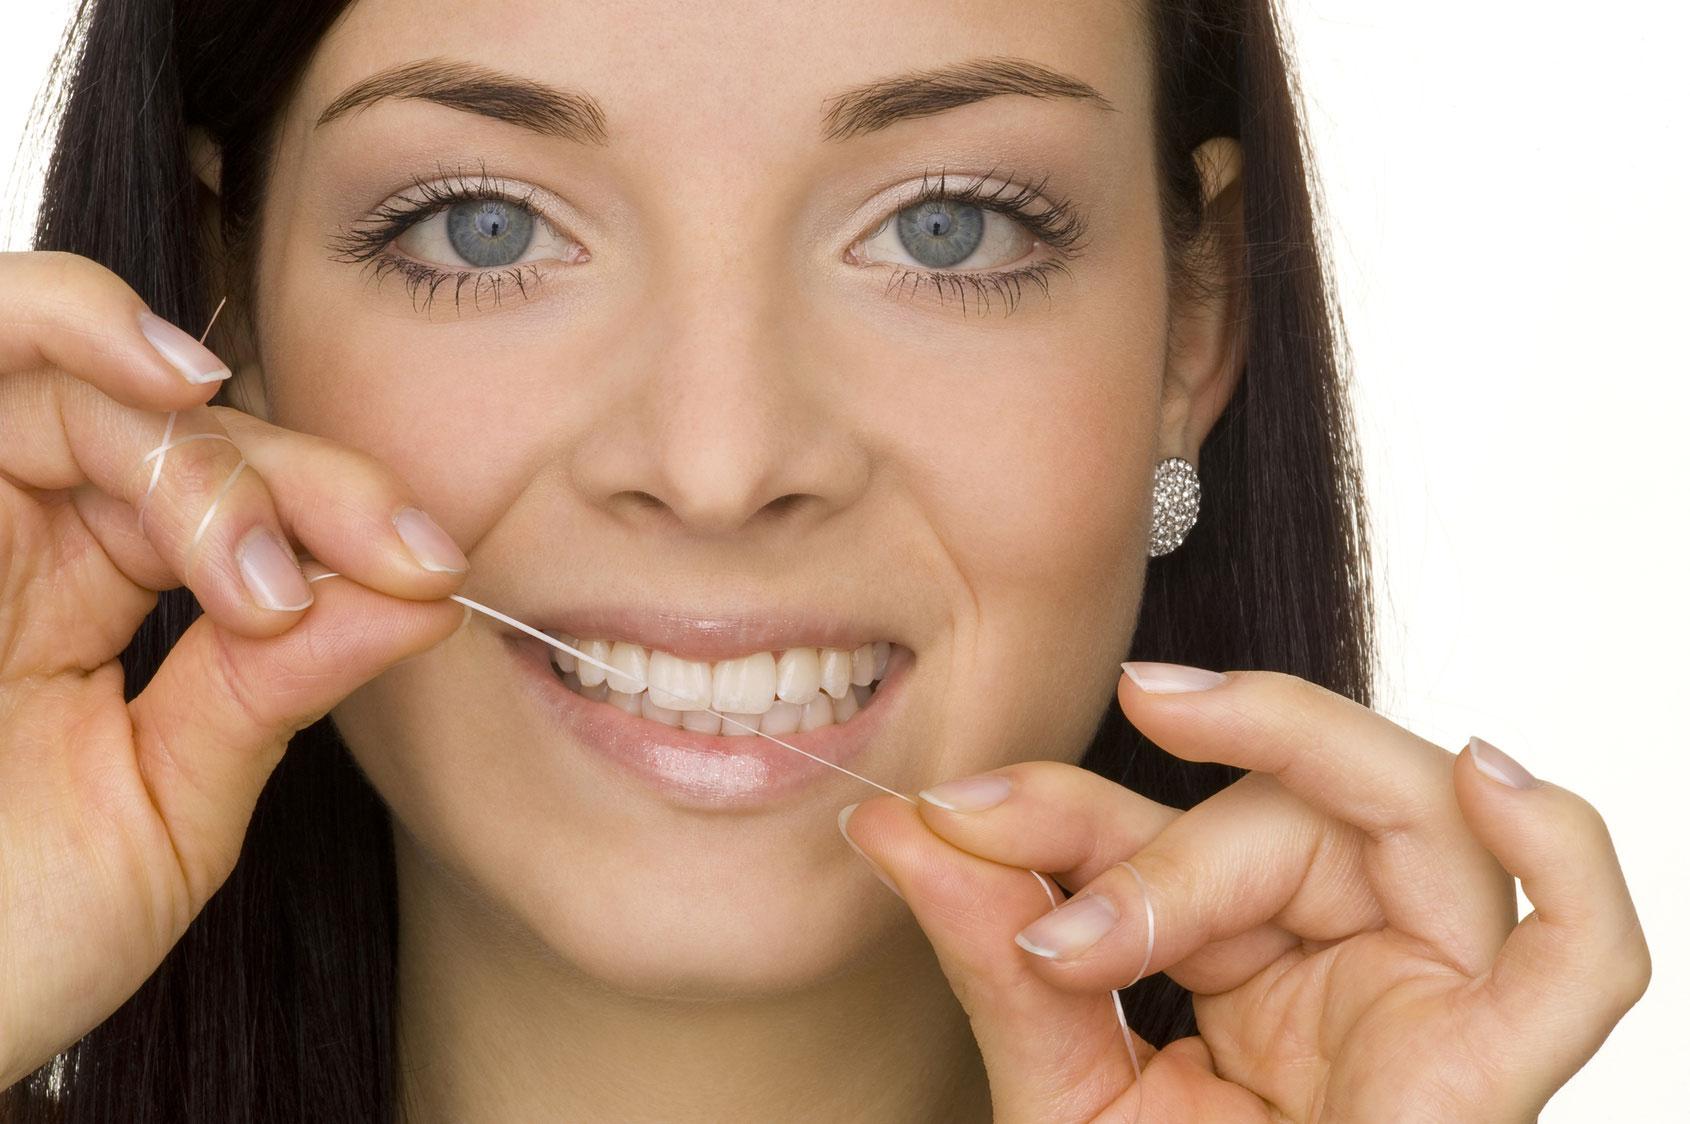 Frau benutzt Zahnseite